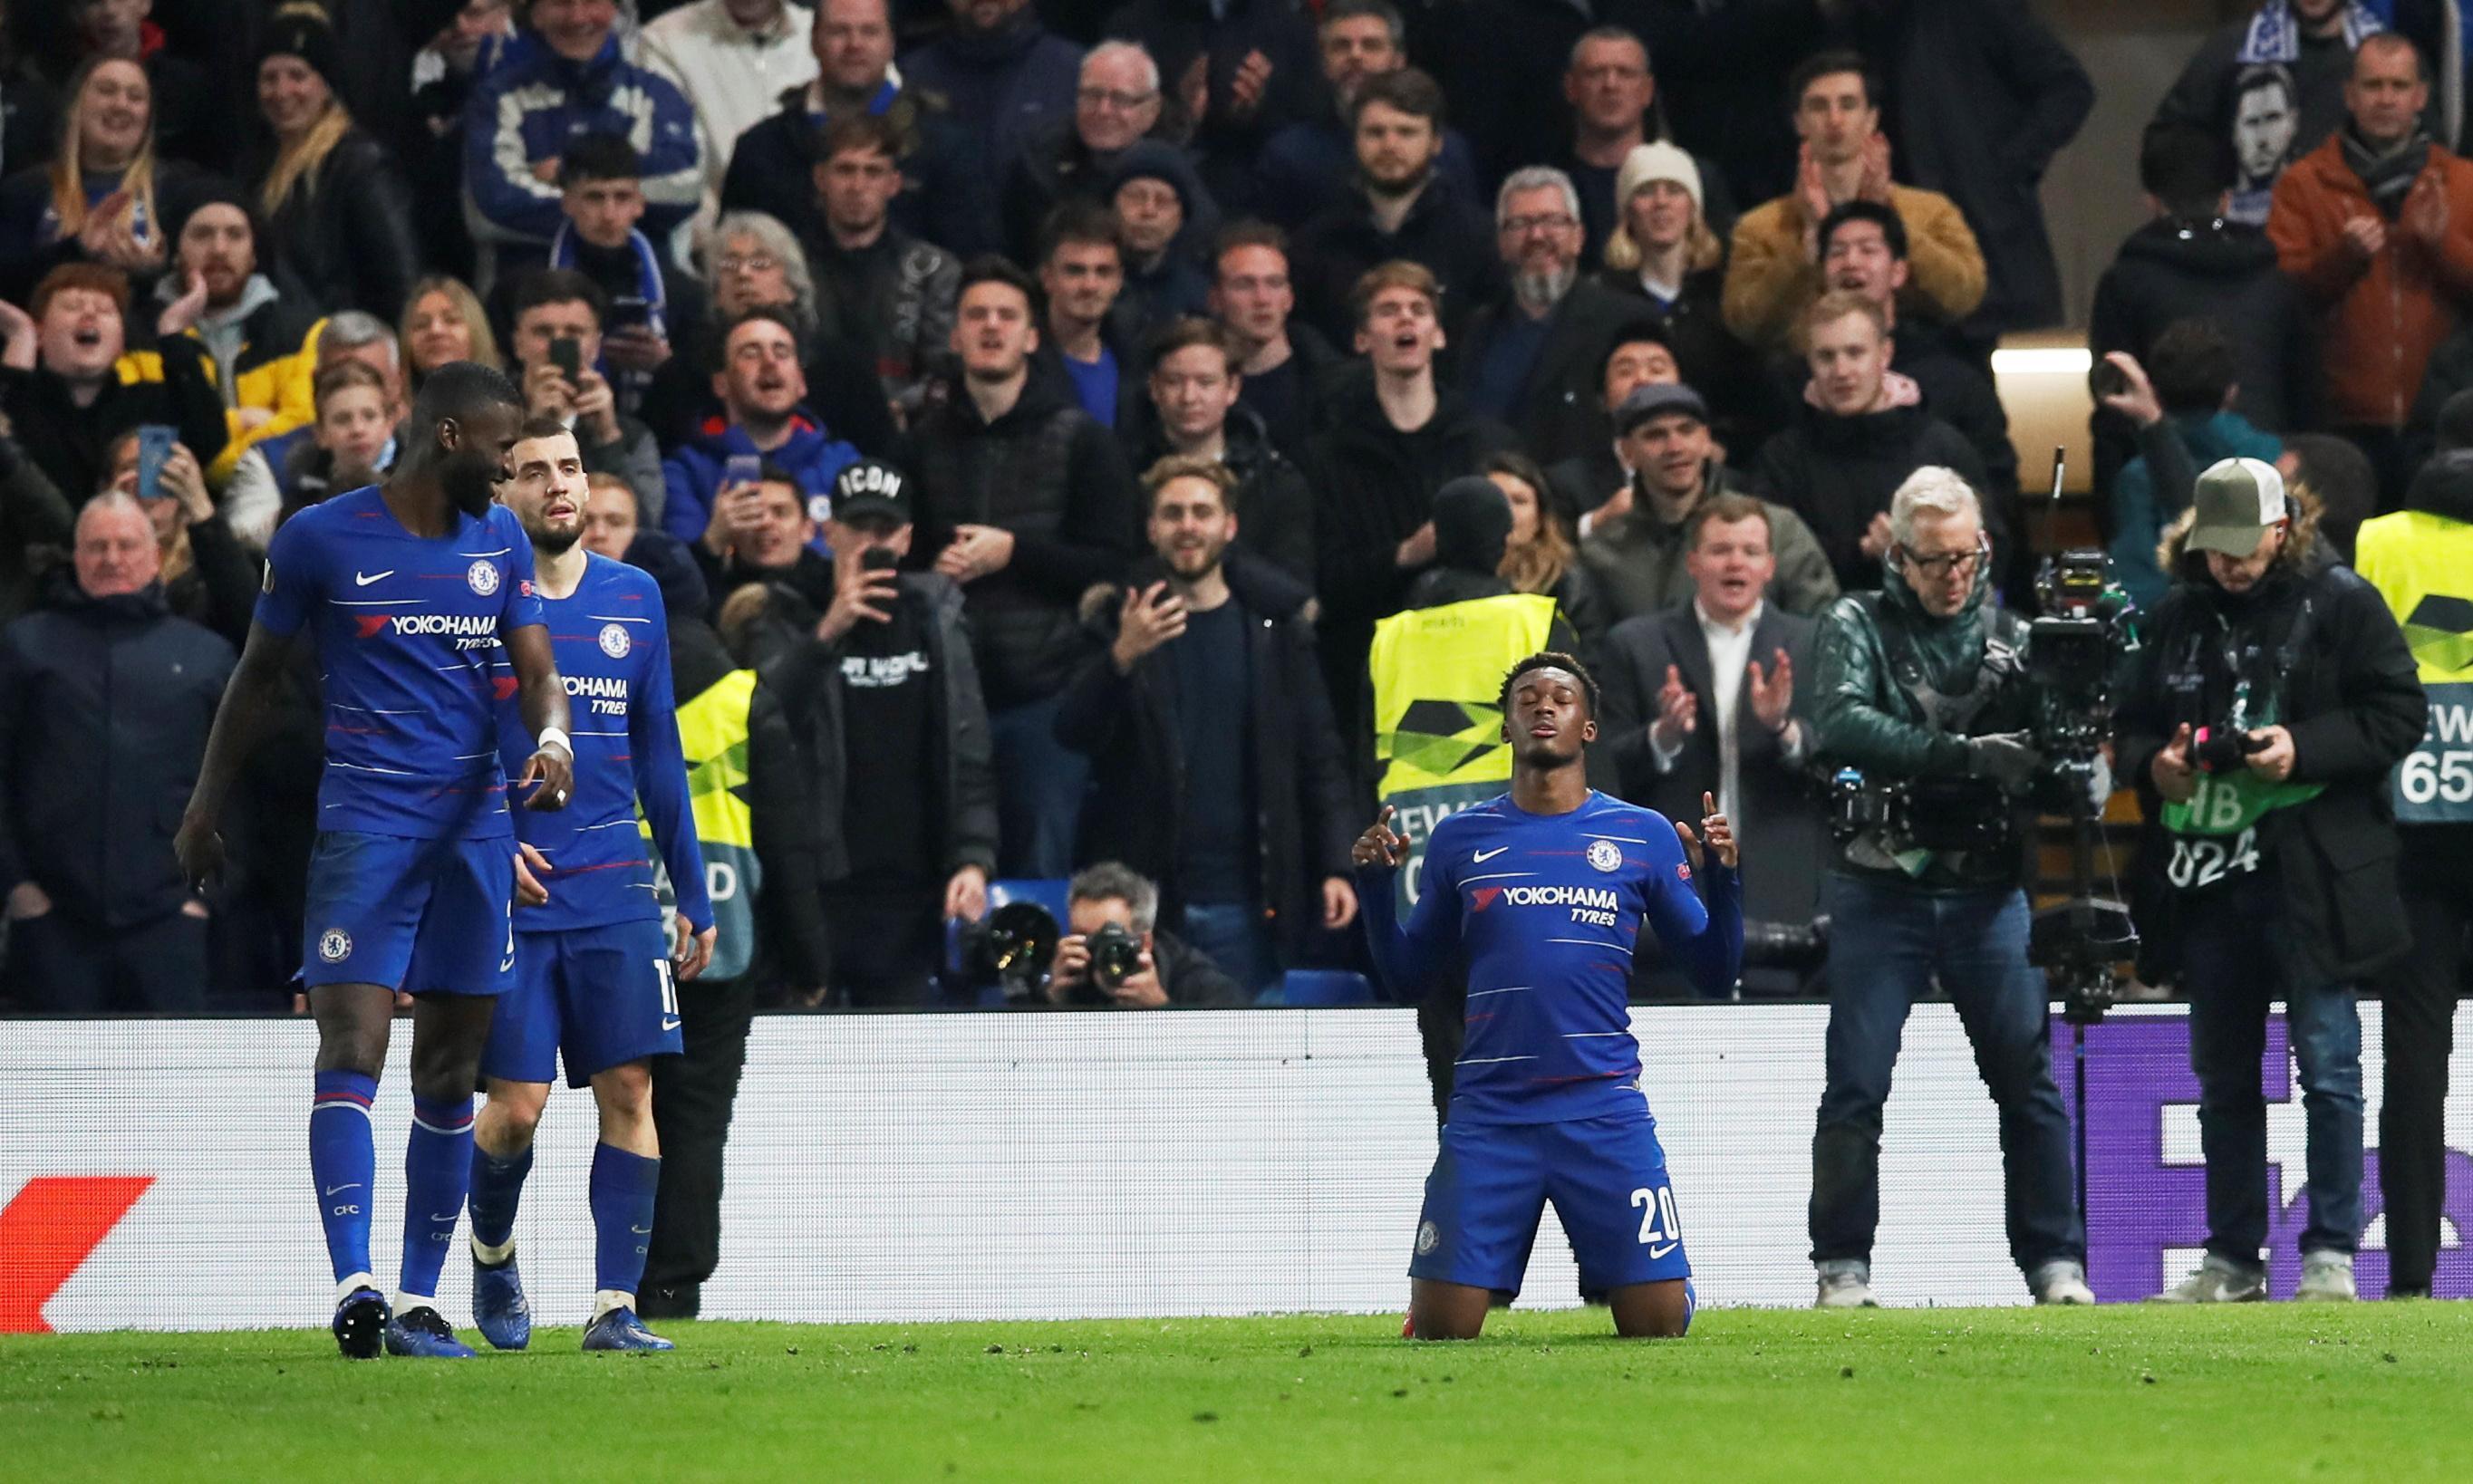 Callum Hudson-Odoi seals comfortable win for Chelsea over Malmö